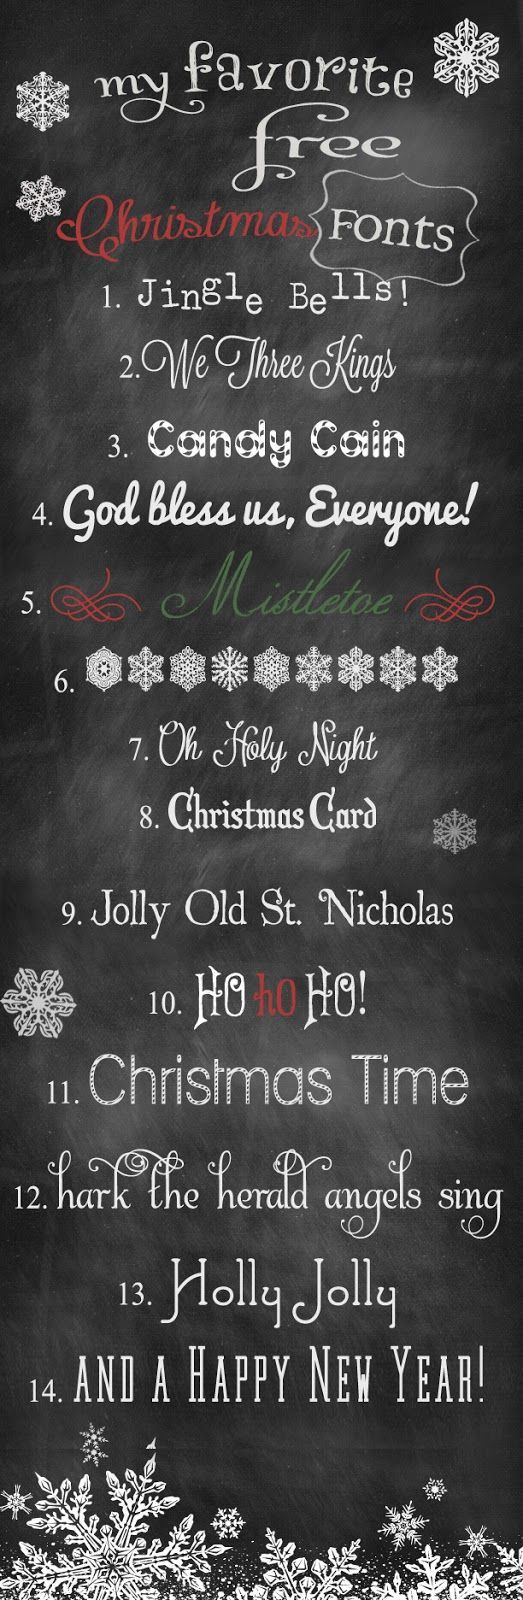 FREE Beautiful Holiday Fonts!.